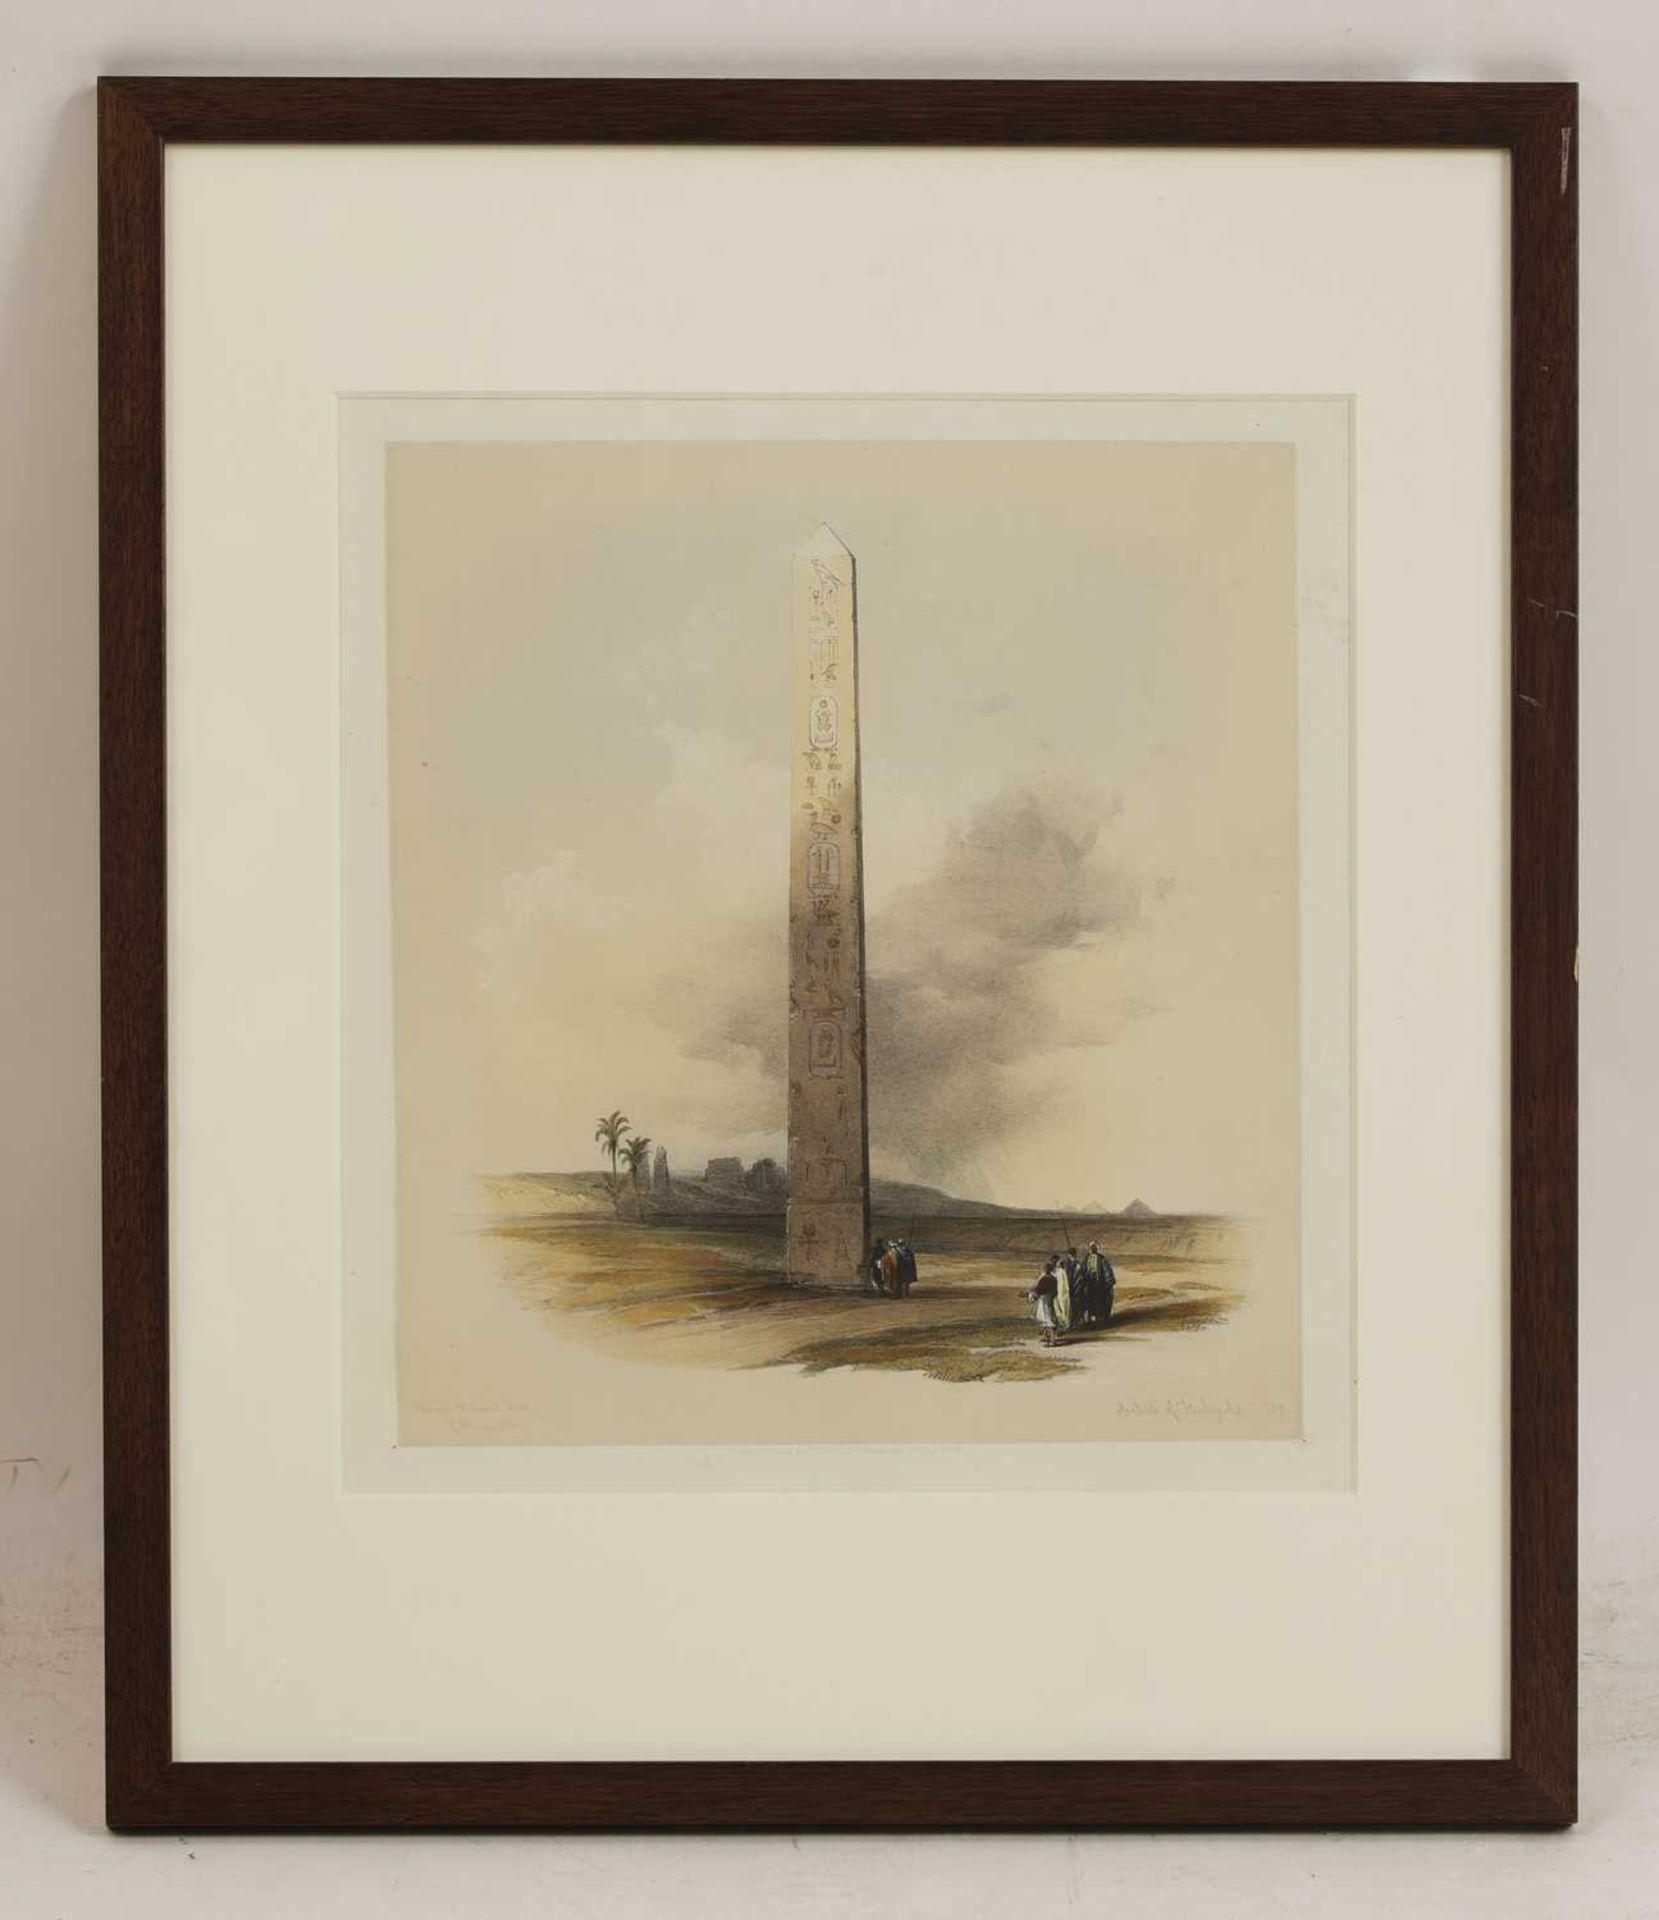 Louis Haghe after David Roberts RA (1796-1864) - Image 11 of 20